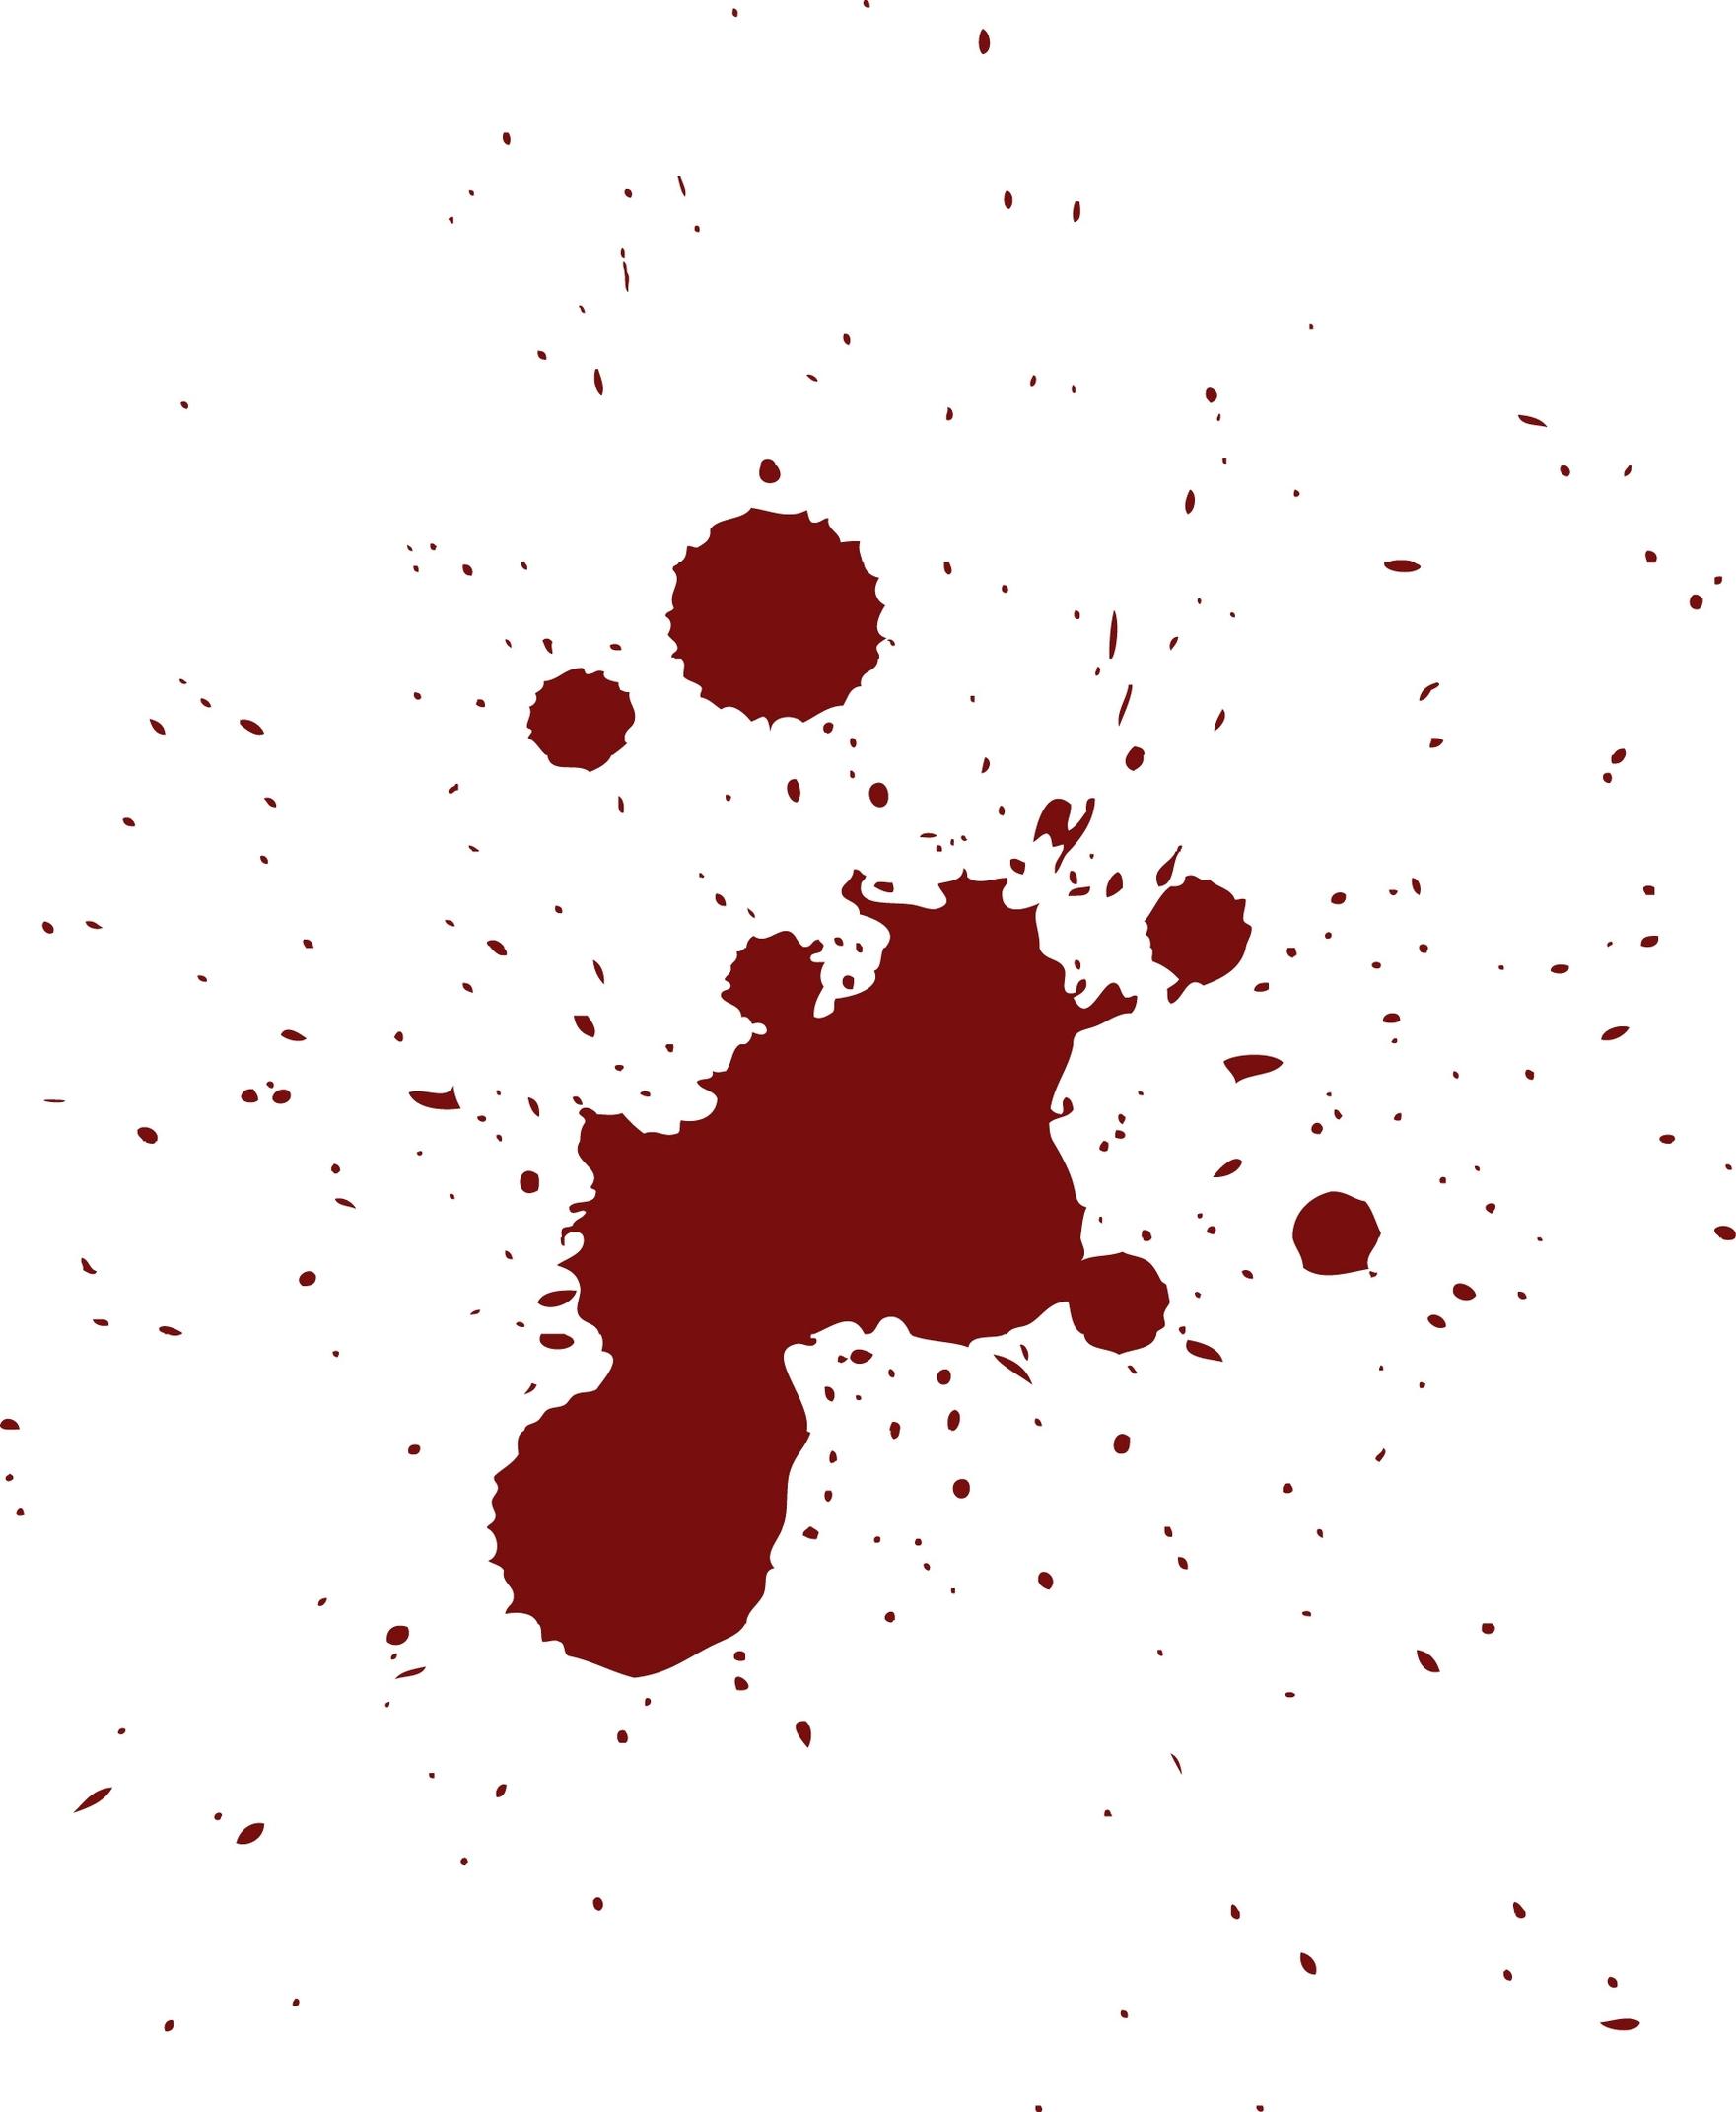 Blood Splatter Clipart & Blood Splatter Clip Art Images.